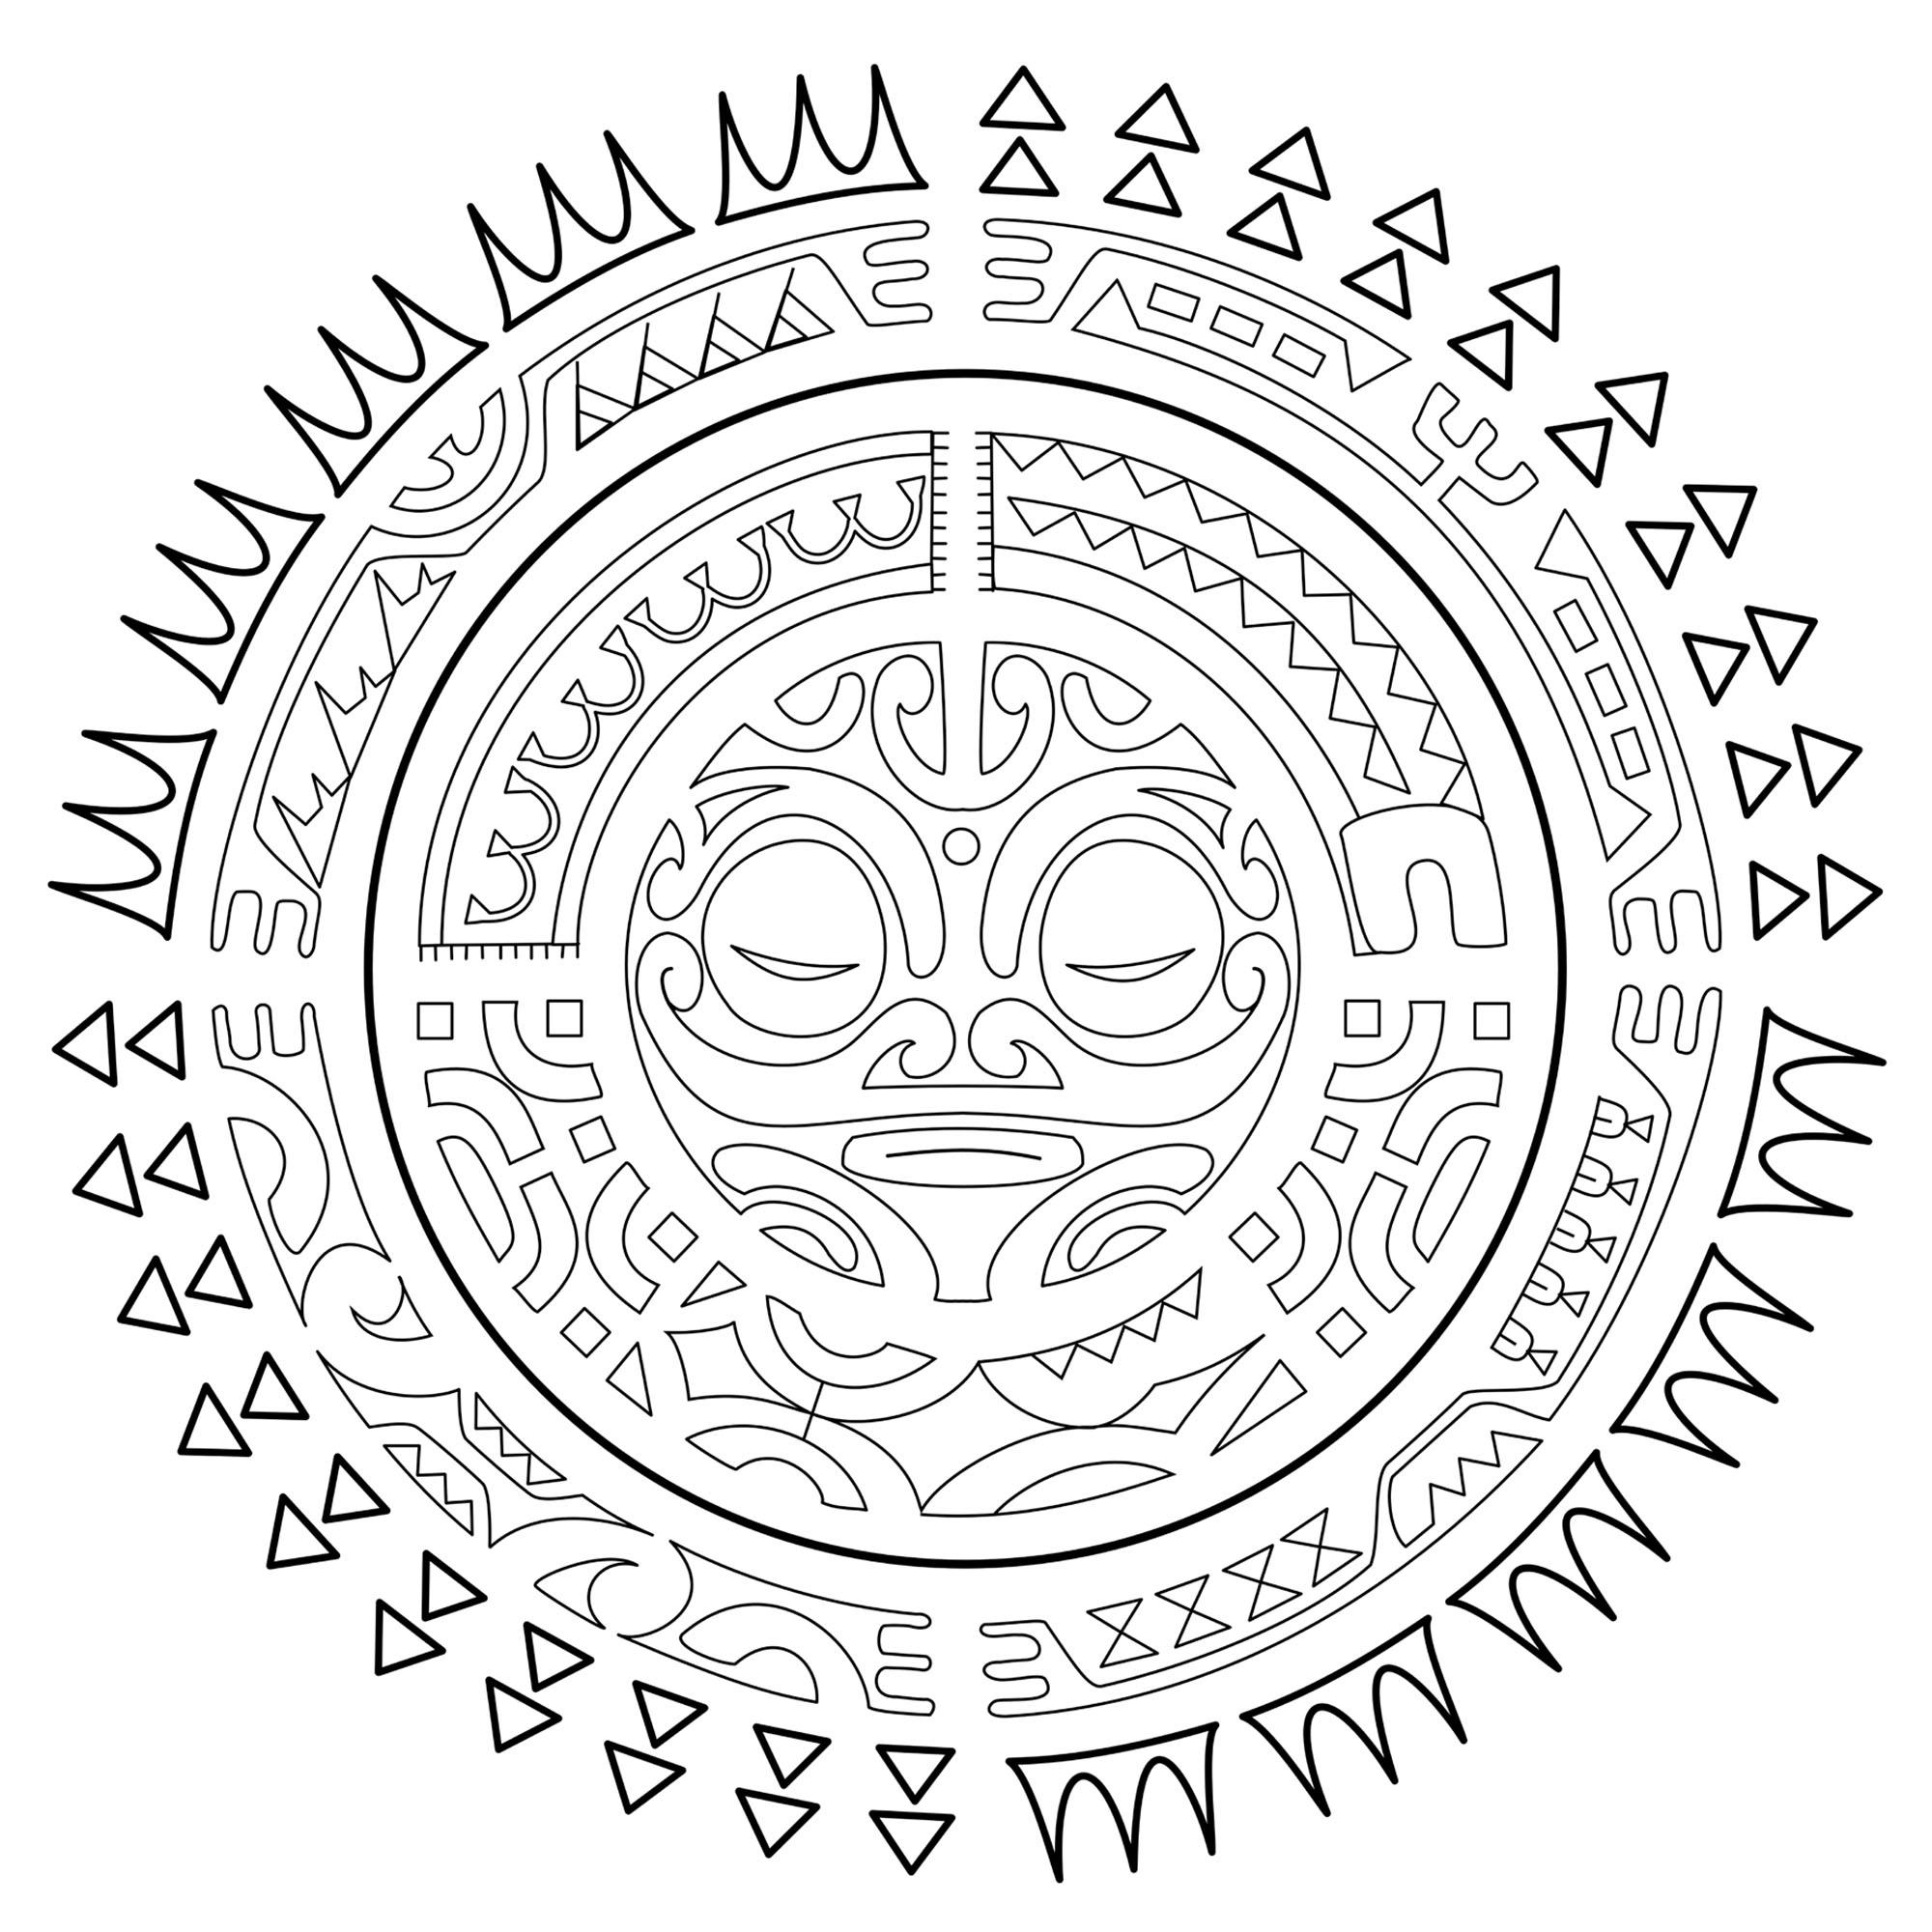 "Tatouage Polynesien : Le soleilColoriage issu du livre Polynesian Tattoos : 42 Modern Tribal Designs to Color and Explore par l'artiste italien Roberto ""GiErre"" Gemori.A découvrir ici : www.shambhala.com/polynesian-tattoos.html Site de l'artiste : Tattootribes.com"